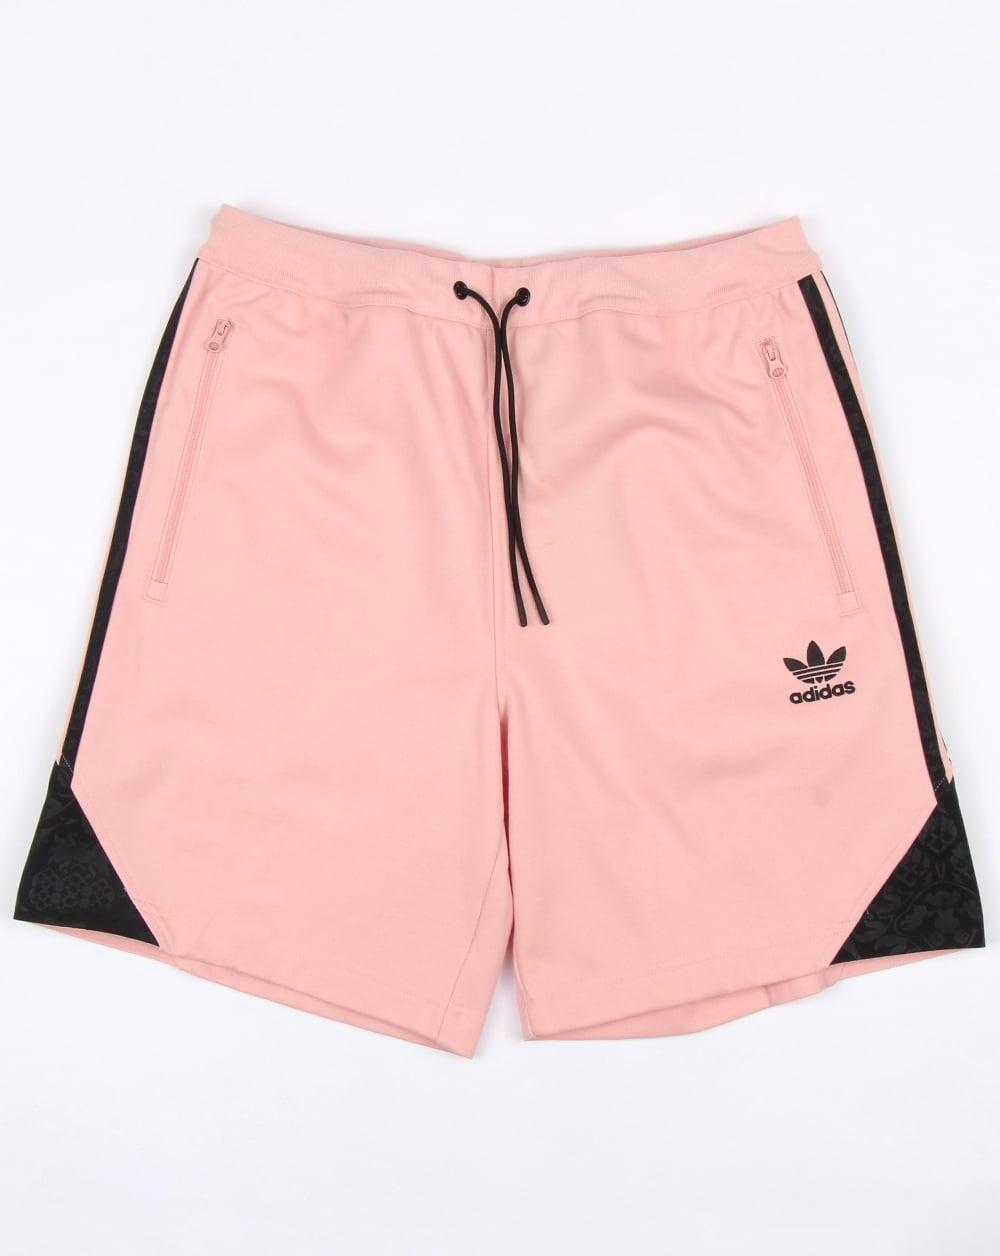 75e966a8b adidas Originals Adidas Originals Ob Shorts Vapour Pink